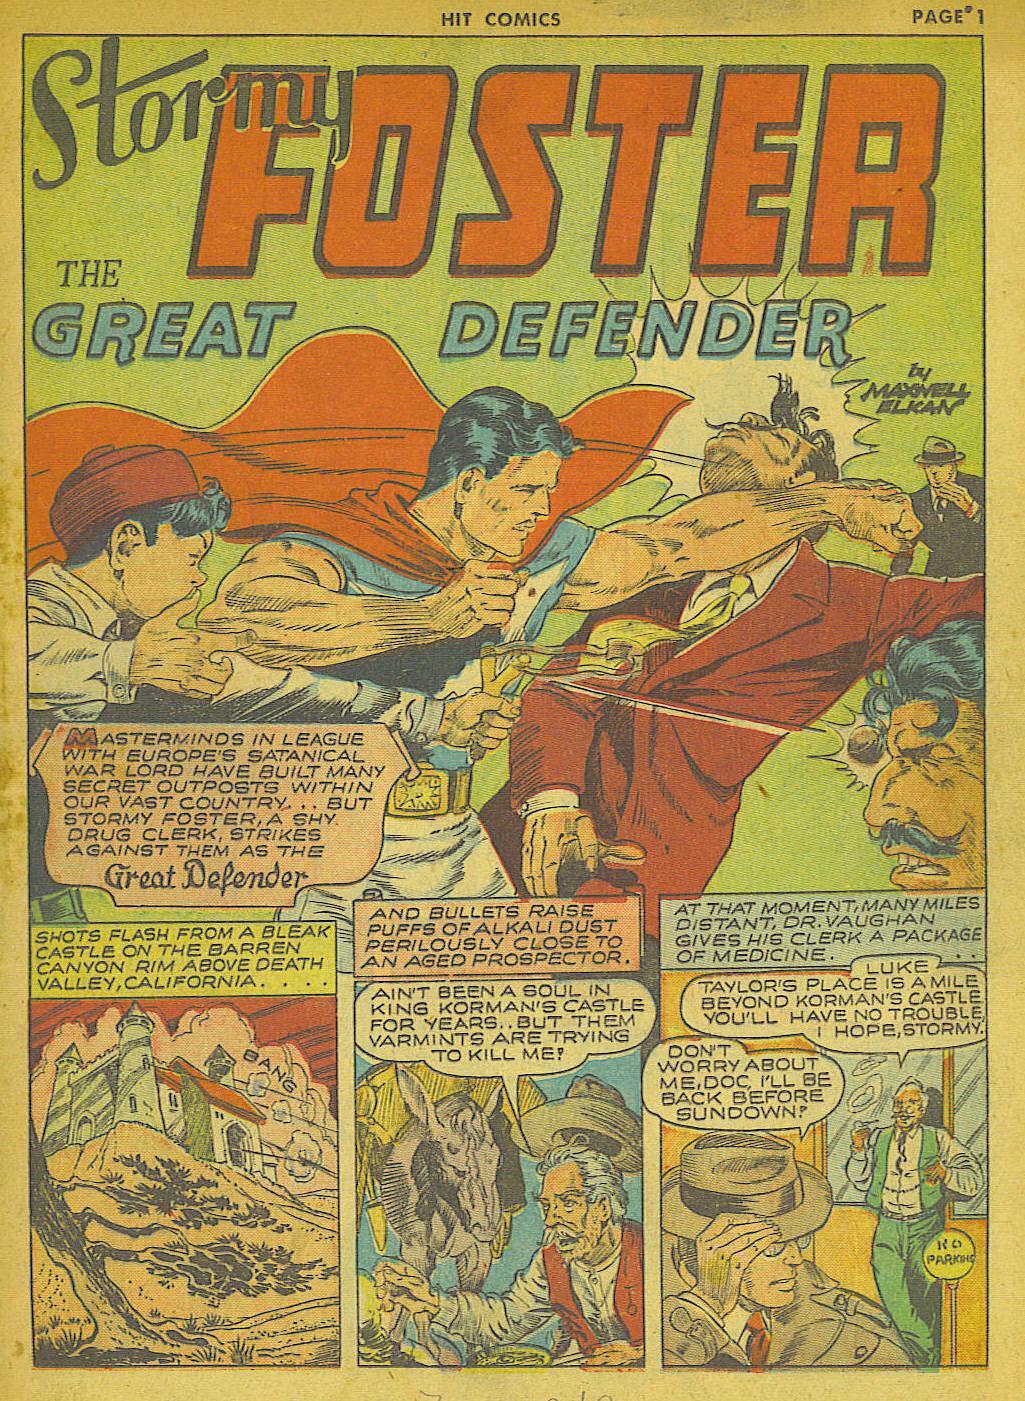 Read online Hit Comics comic -  Issue #21 - 3